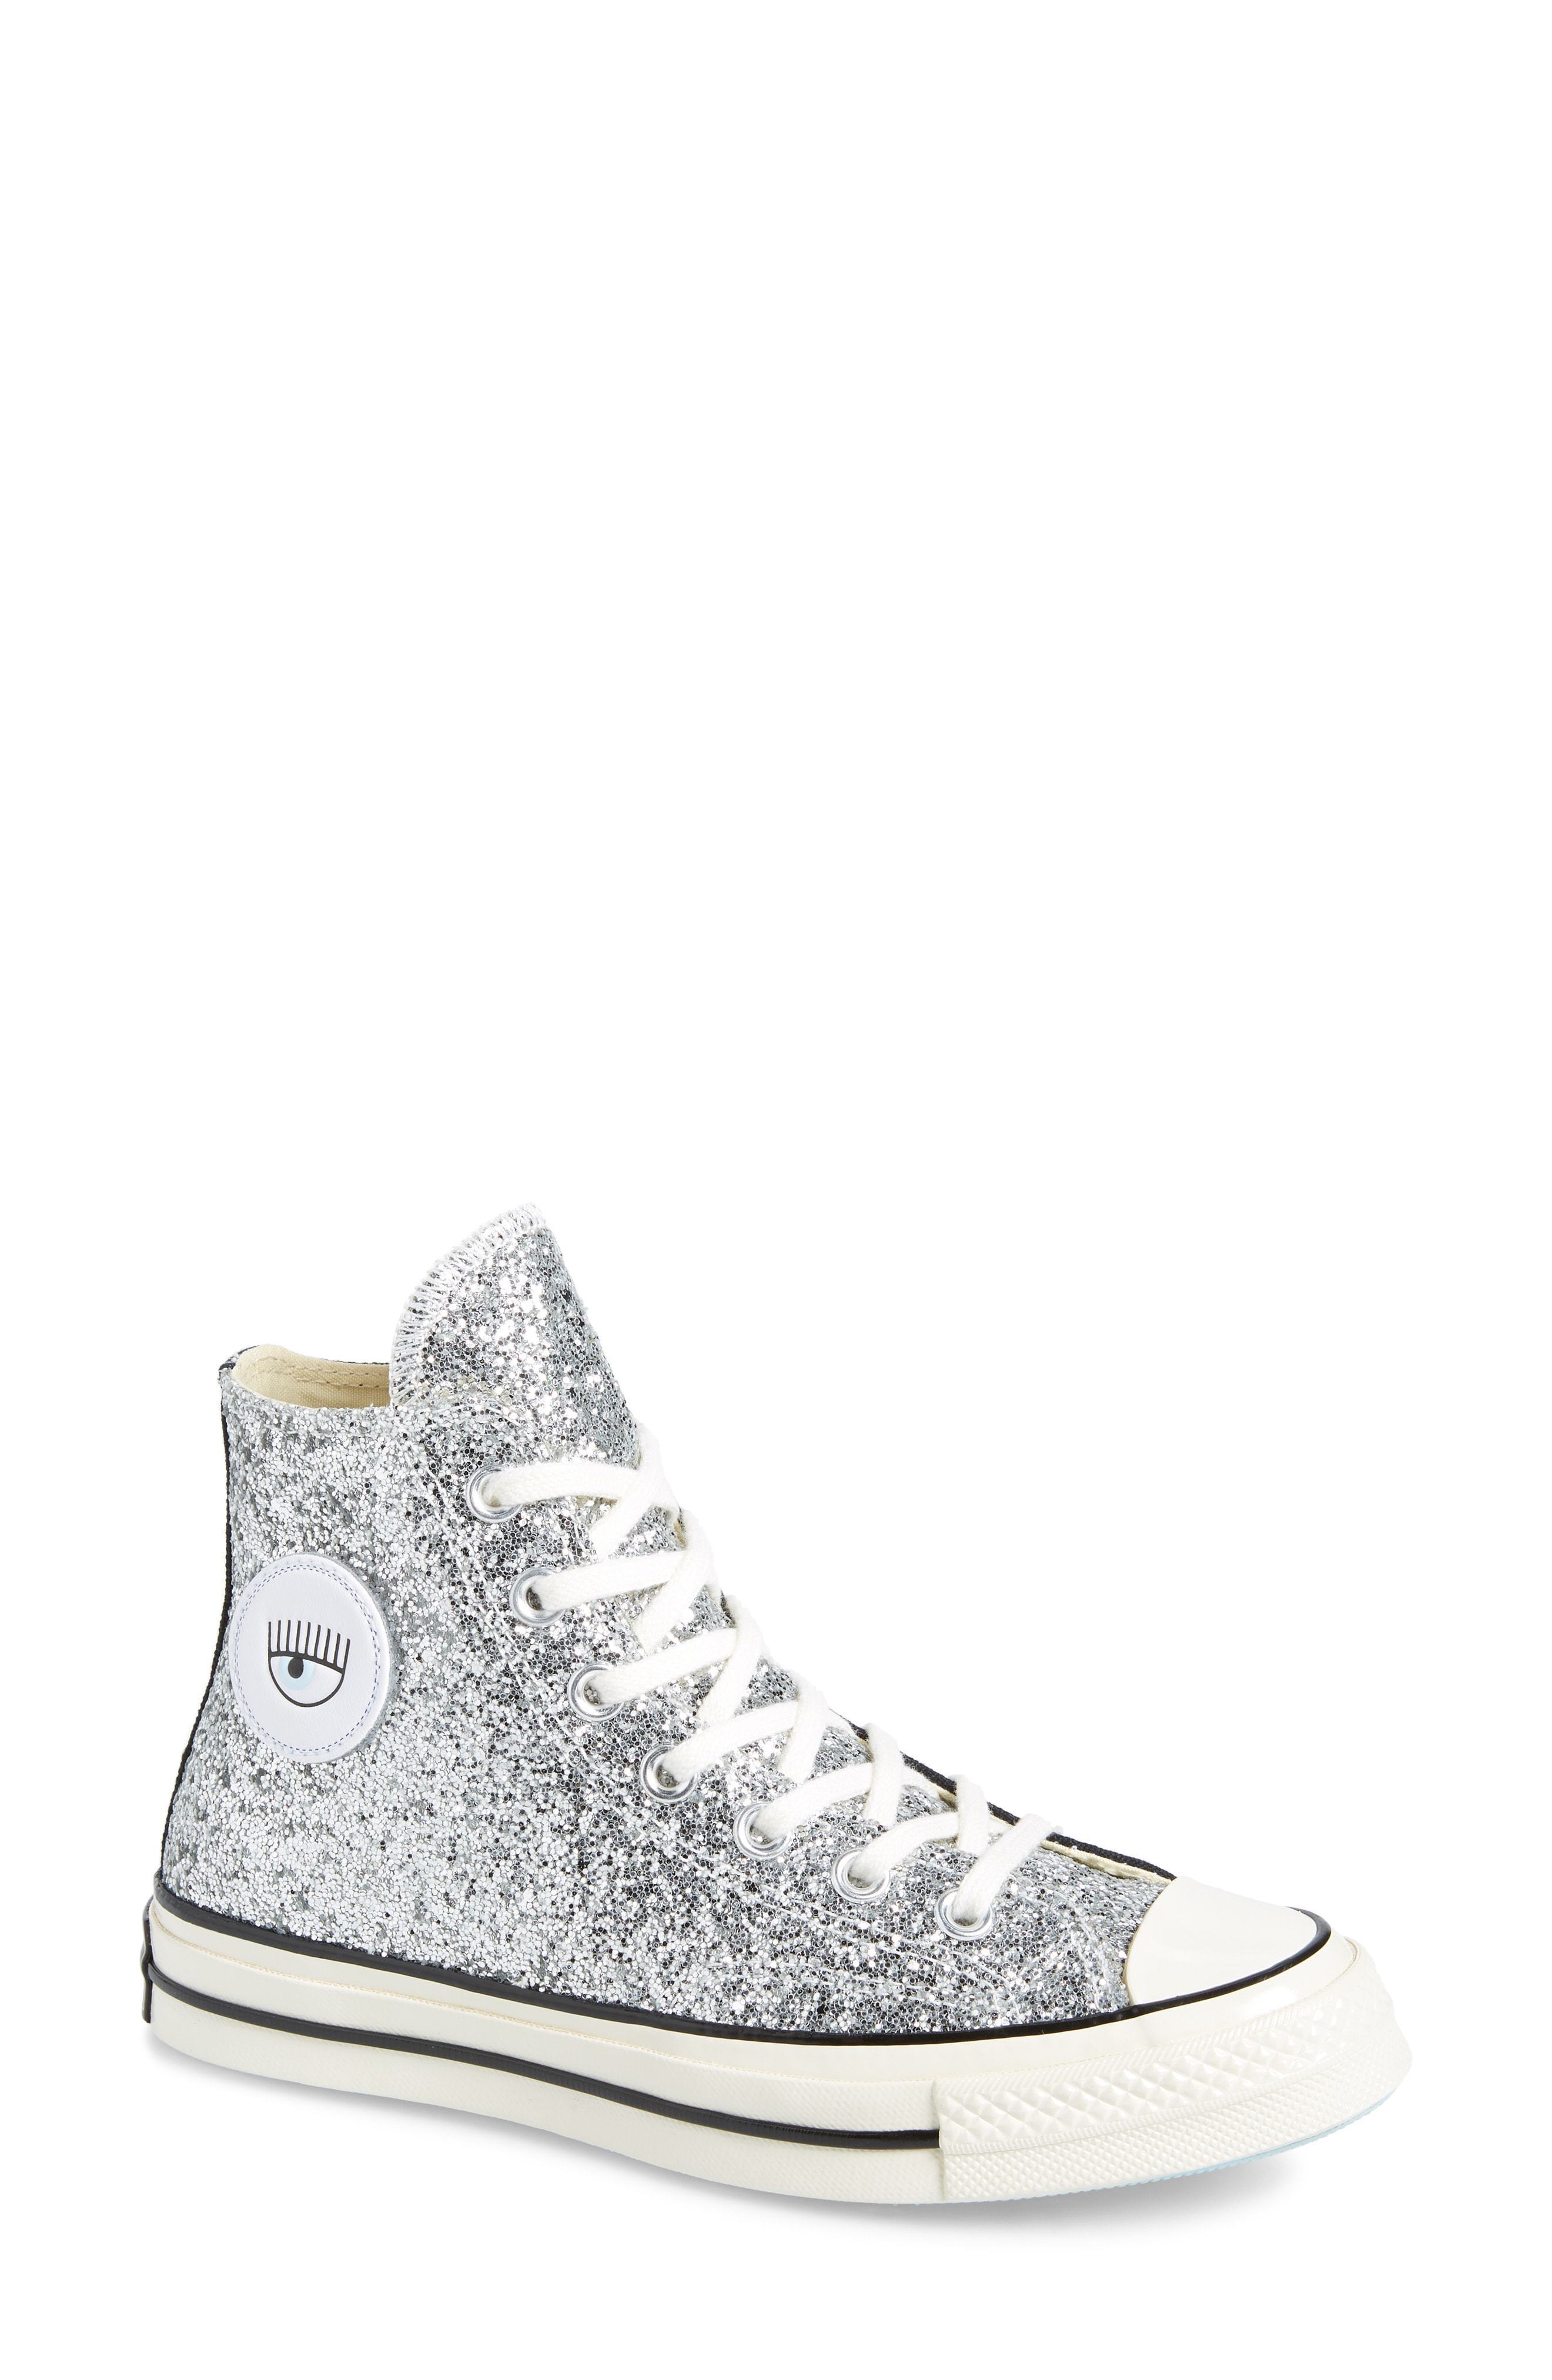 ... Converse X Chiara Ferragni Two Tone High Top Sneaker